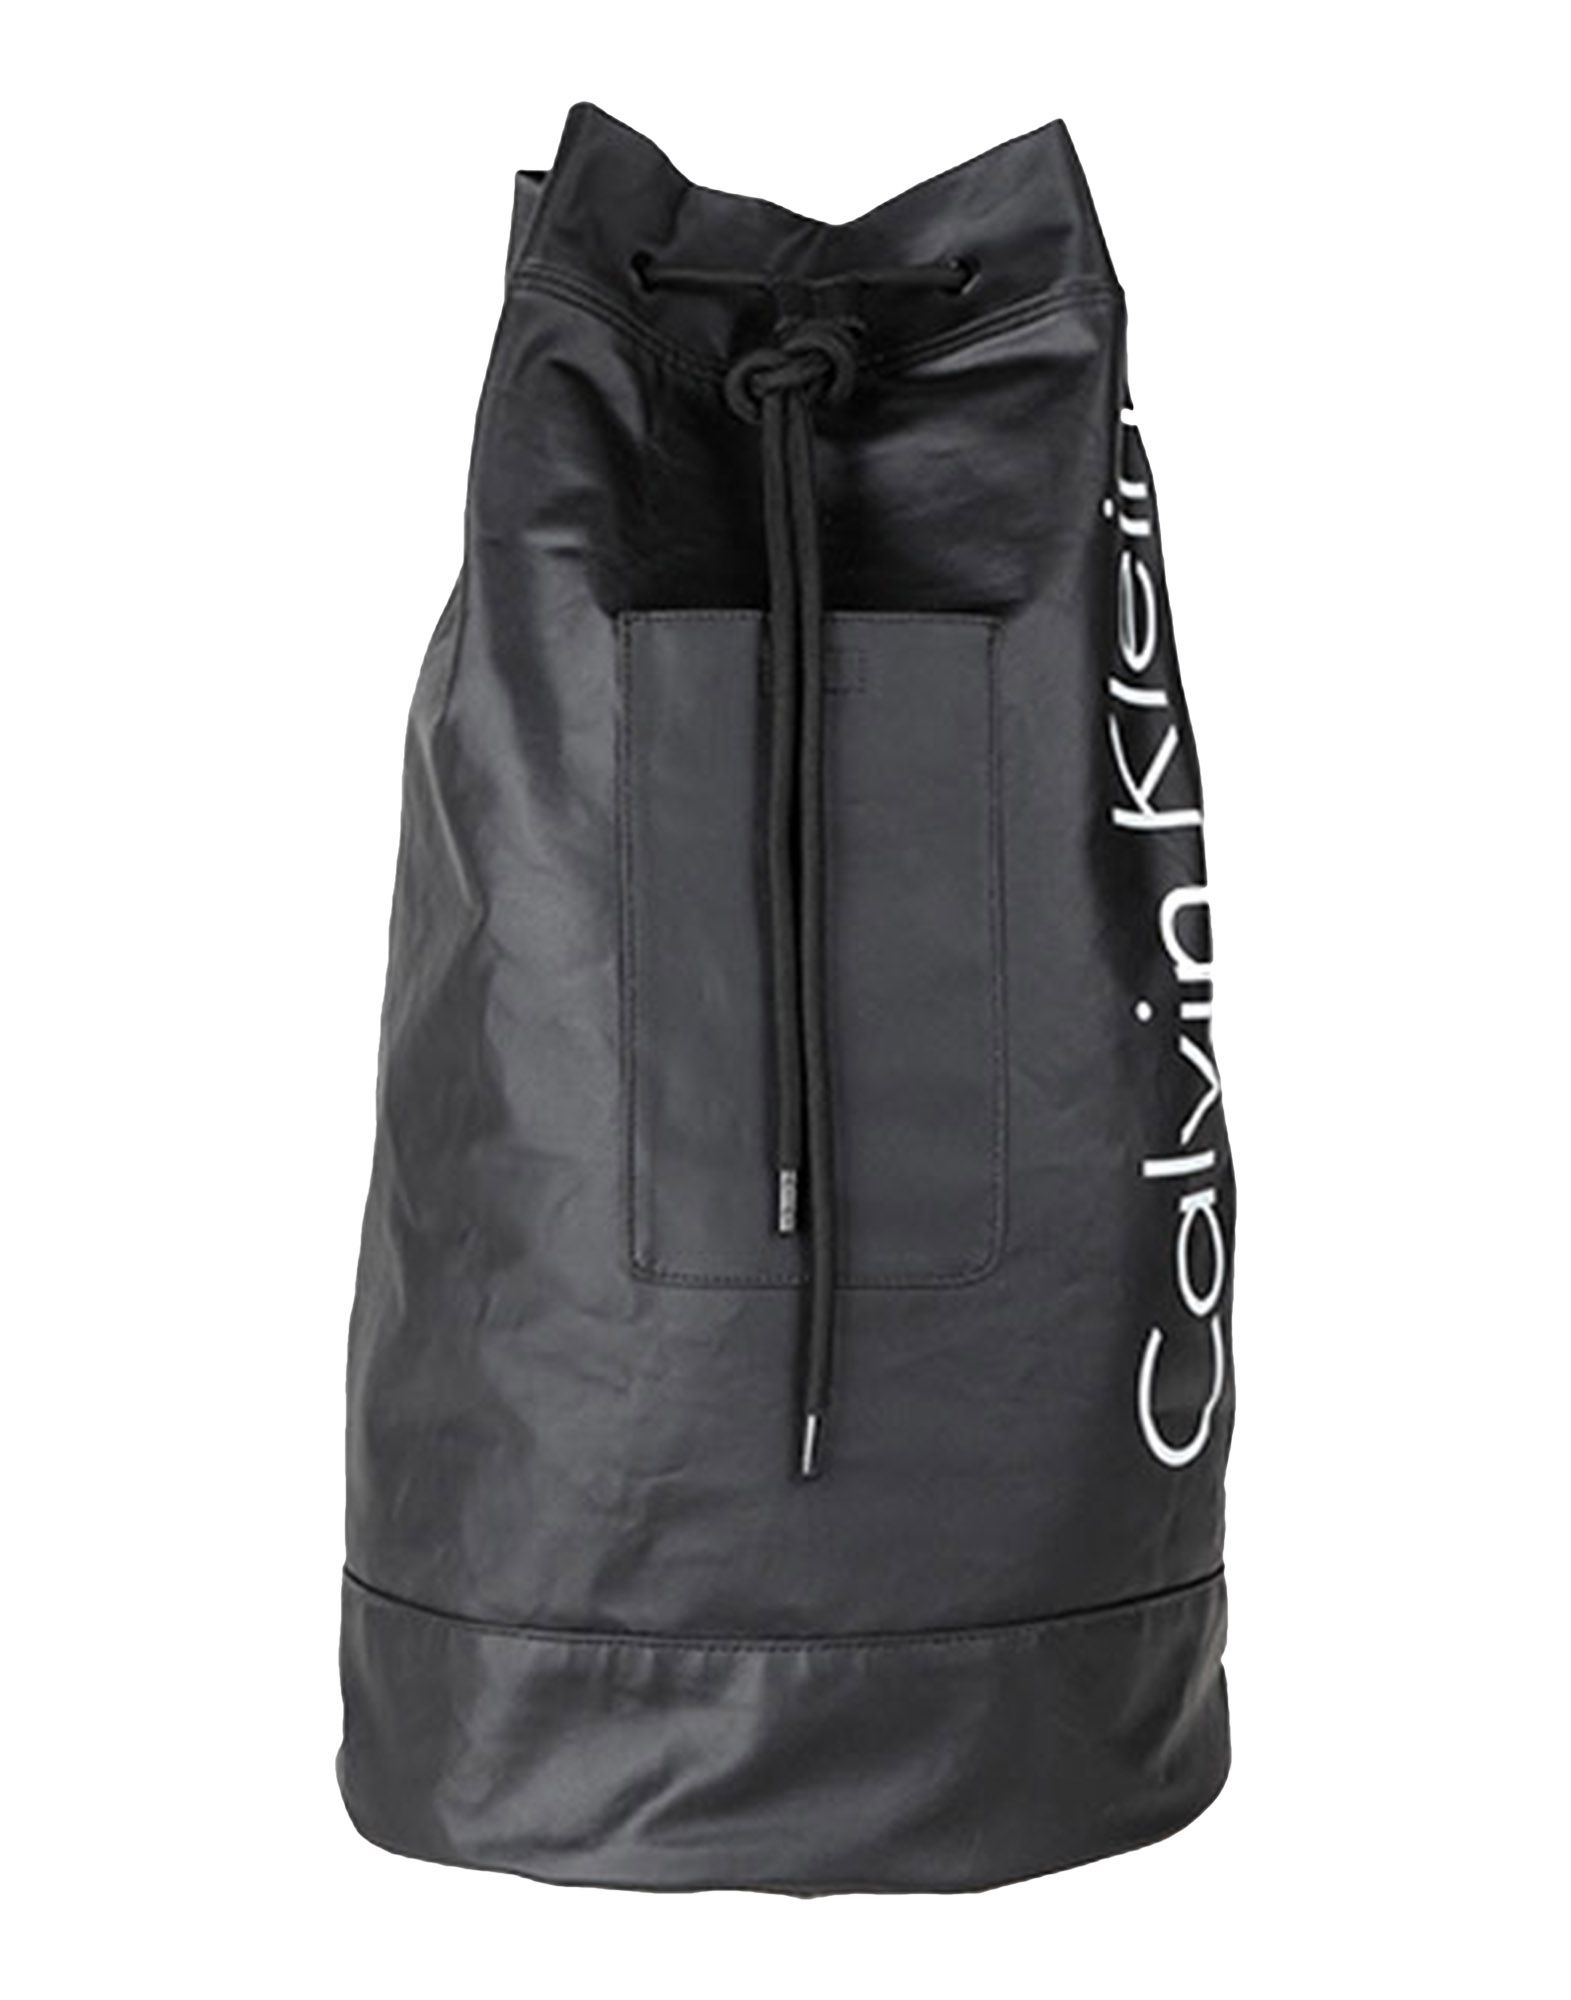 CALVIN KLEIN Дорожная сумка бита aist 1323025tt torx с отверстием под штифт тt25 10мм l 30мм s2 1 шт